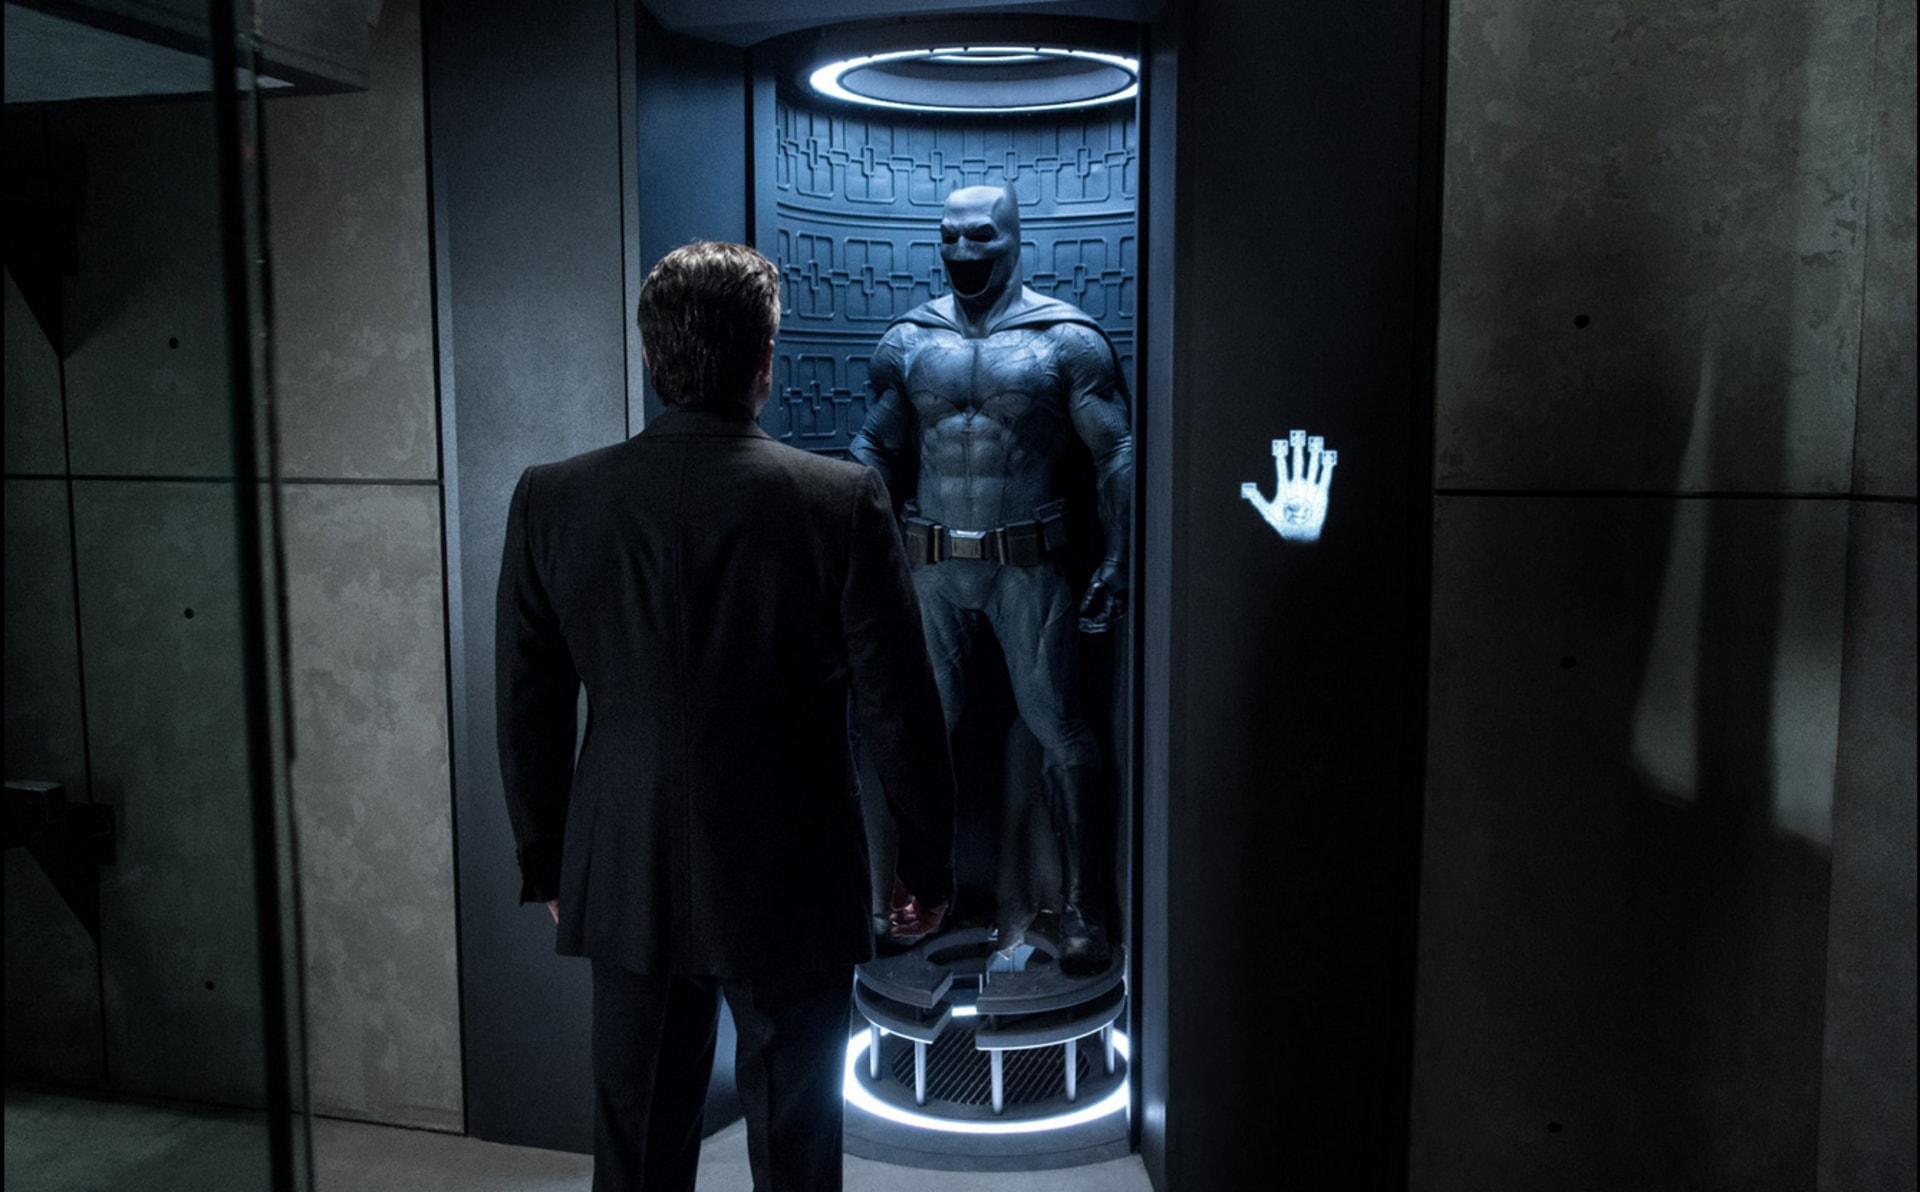 BEN AFFLECK as Batman / Bruce Wayne